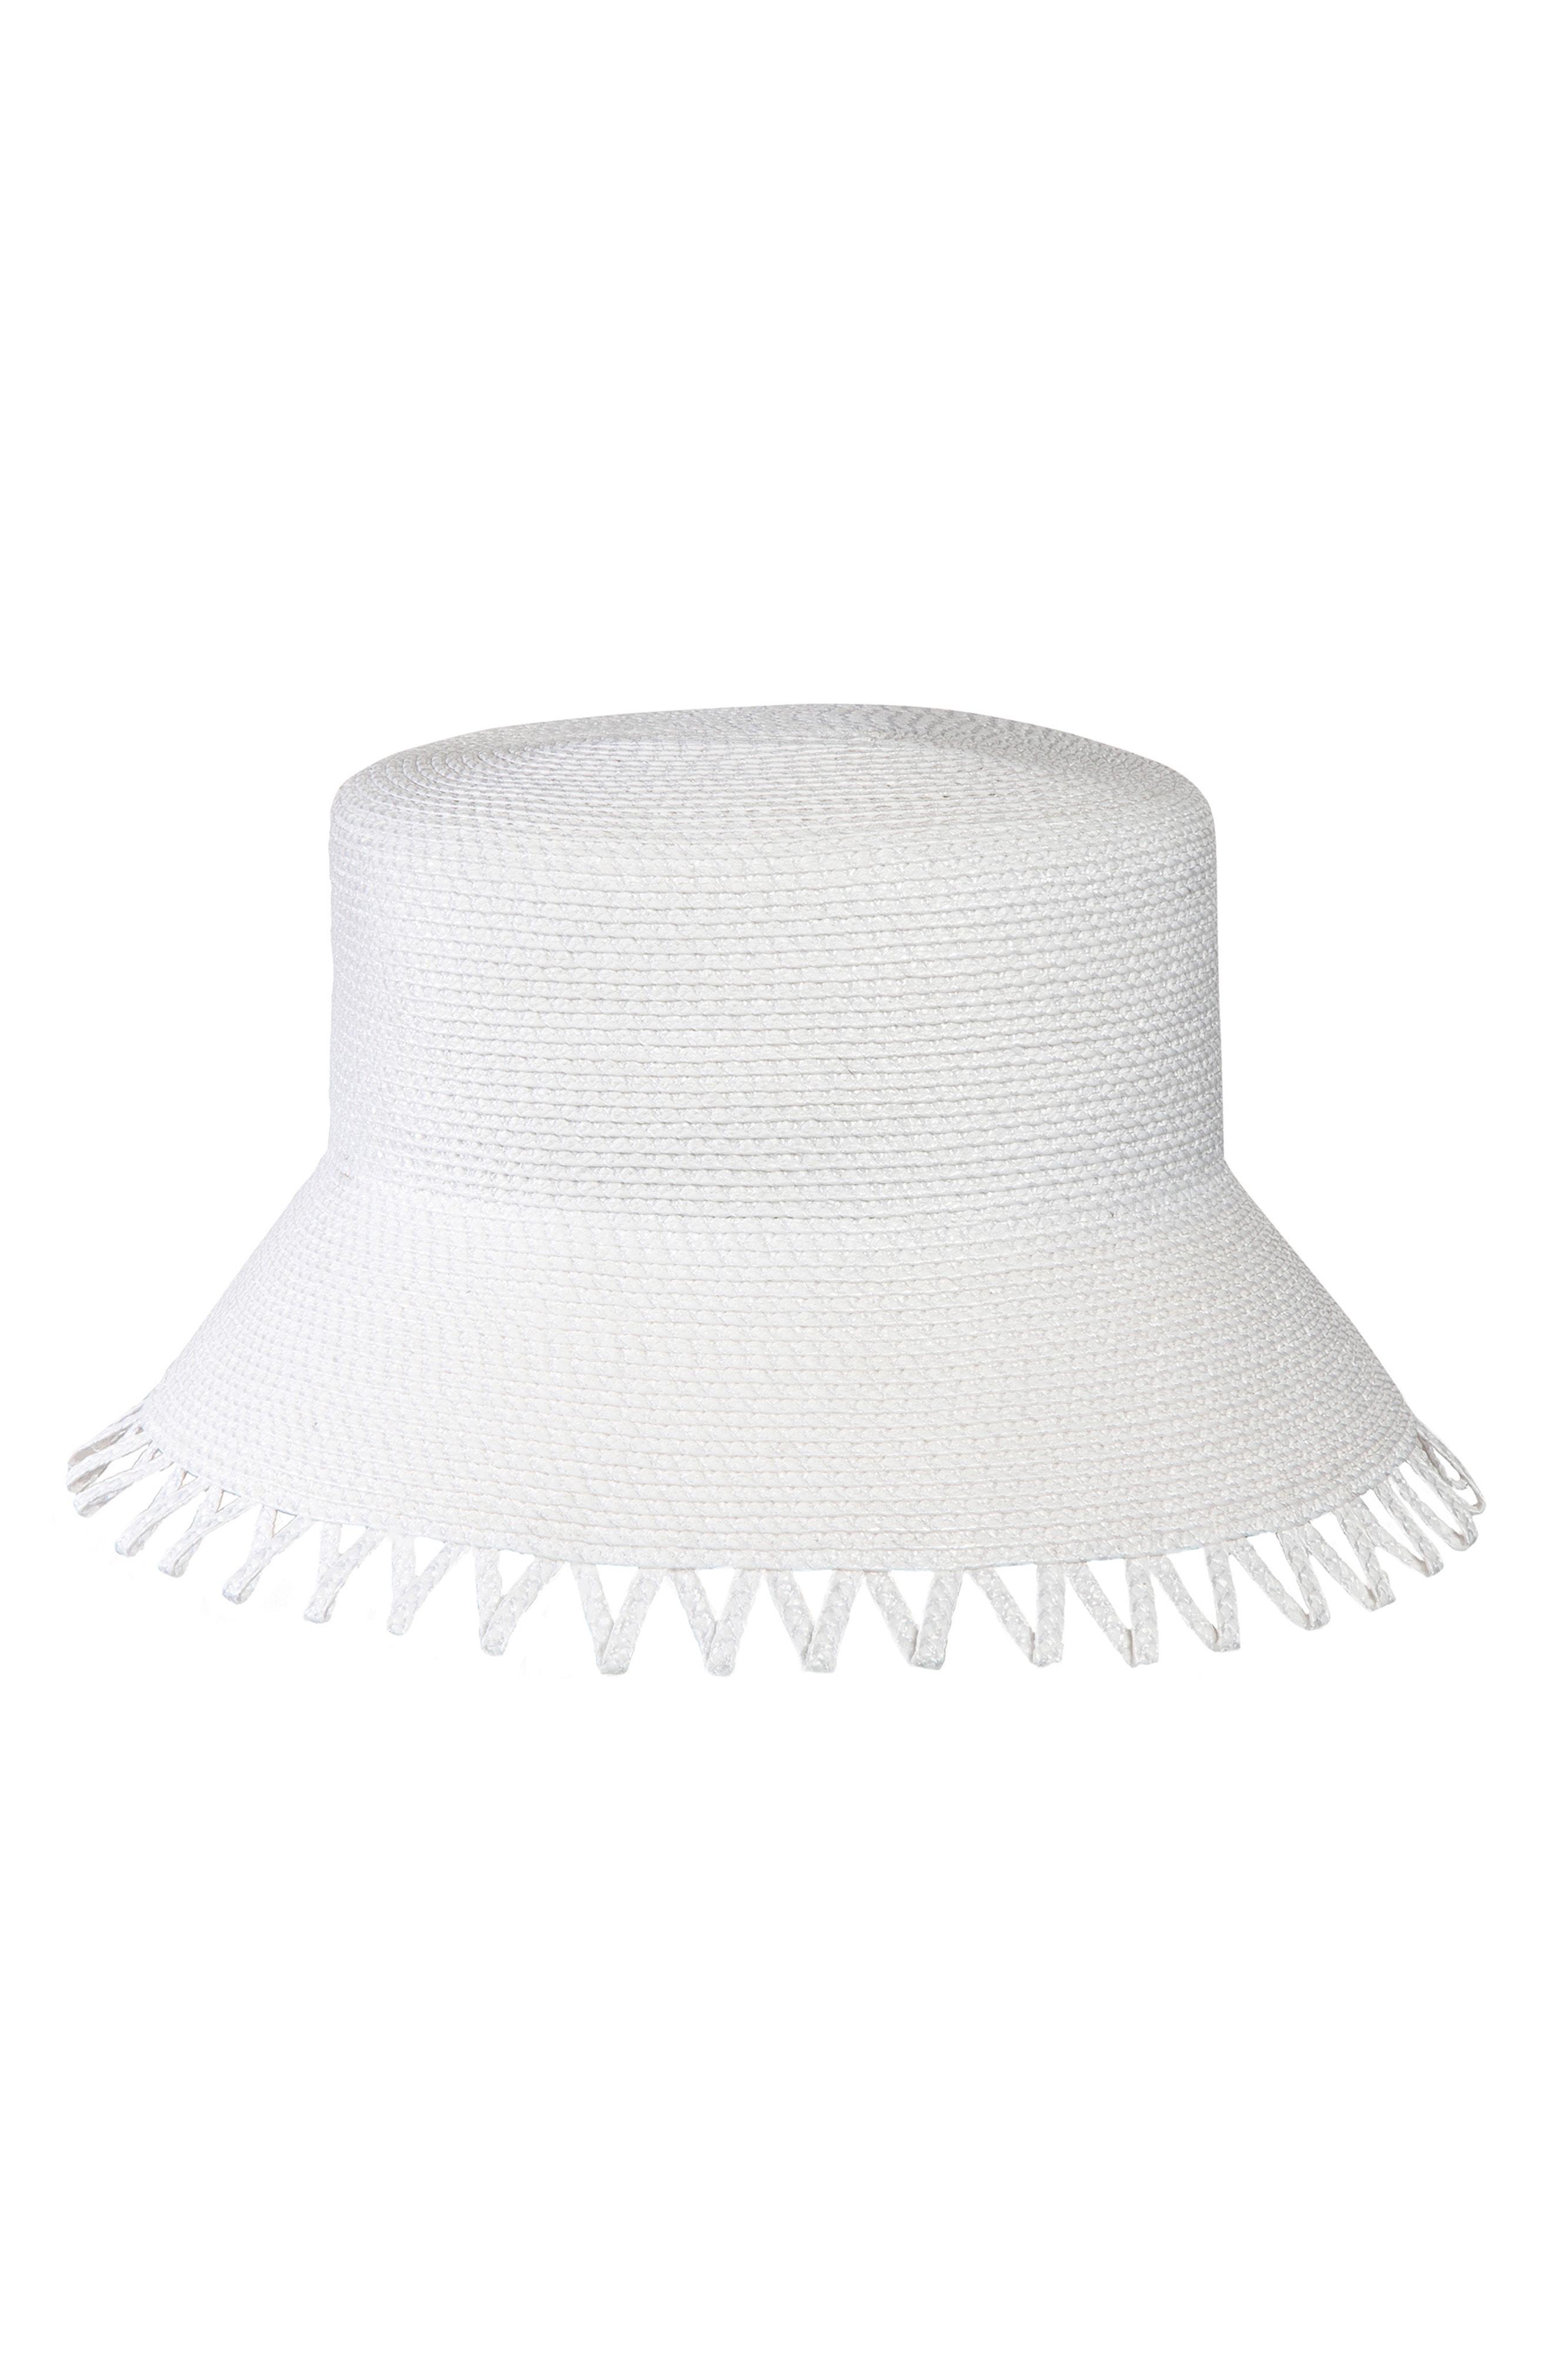 793cc542da2 Eric Javits Eloise Squishee Bucket Hat - White